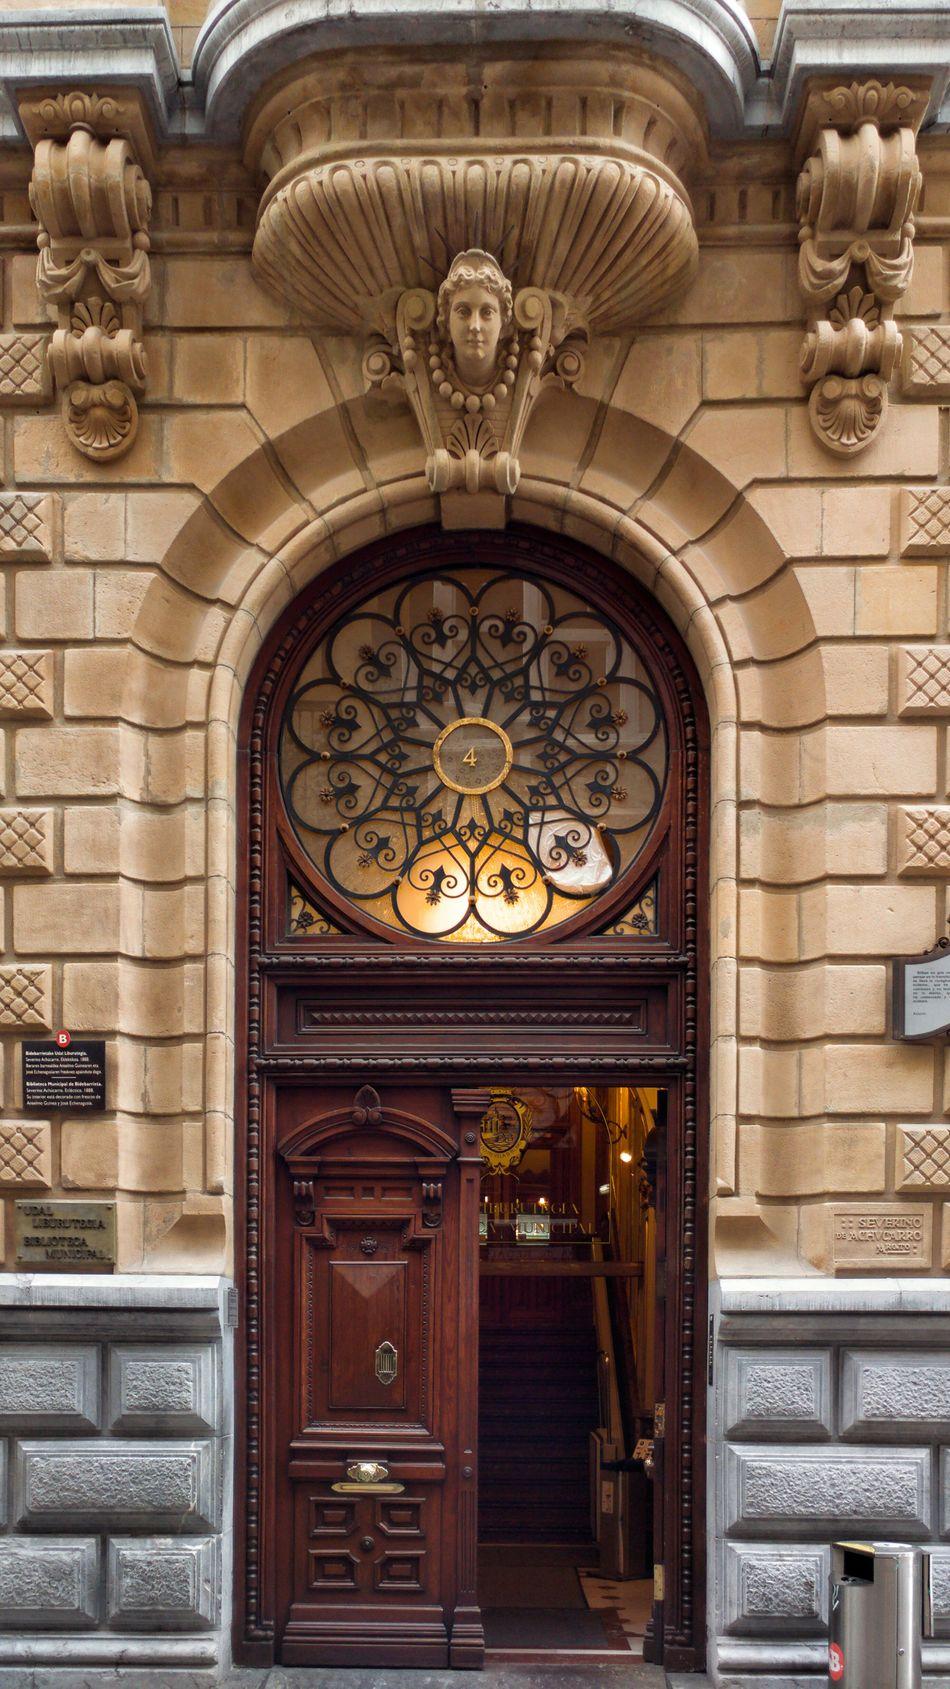 Architecture No People Entry Door Library Building Library Biblioteca Bilbaolovers Bilbao Bizkaia Doors